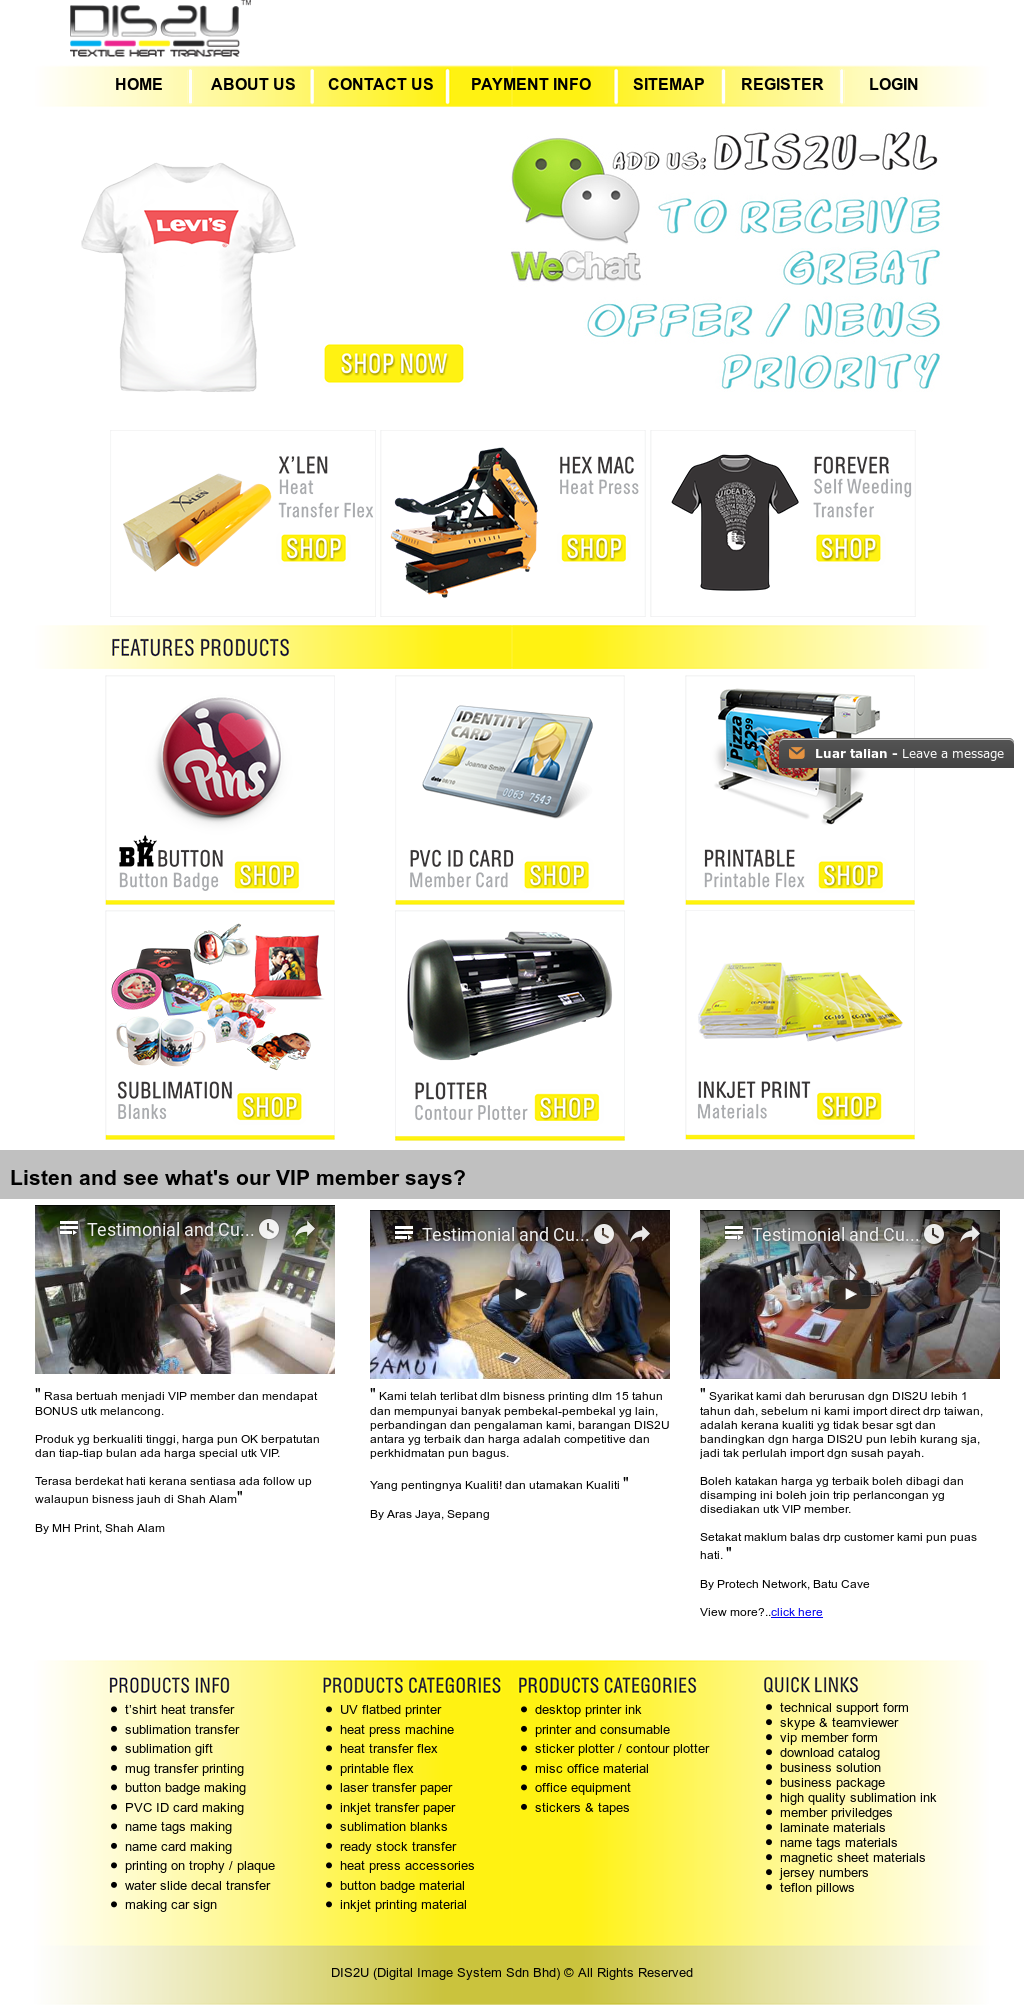 DIS2U Competitors, Revenue and Employees - Owler Company Profile